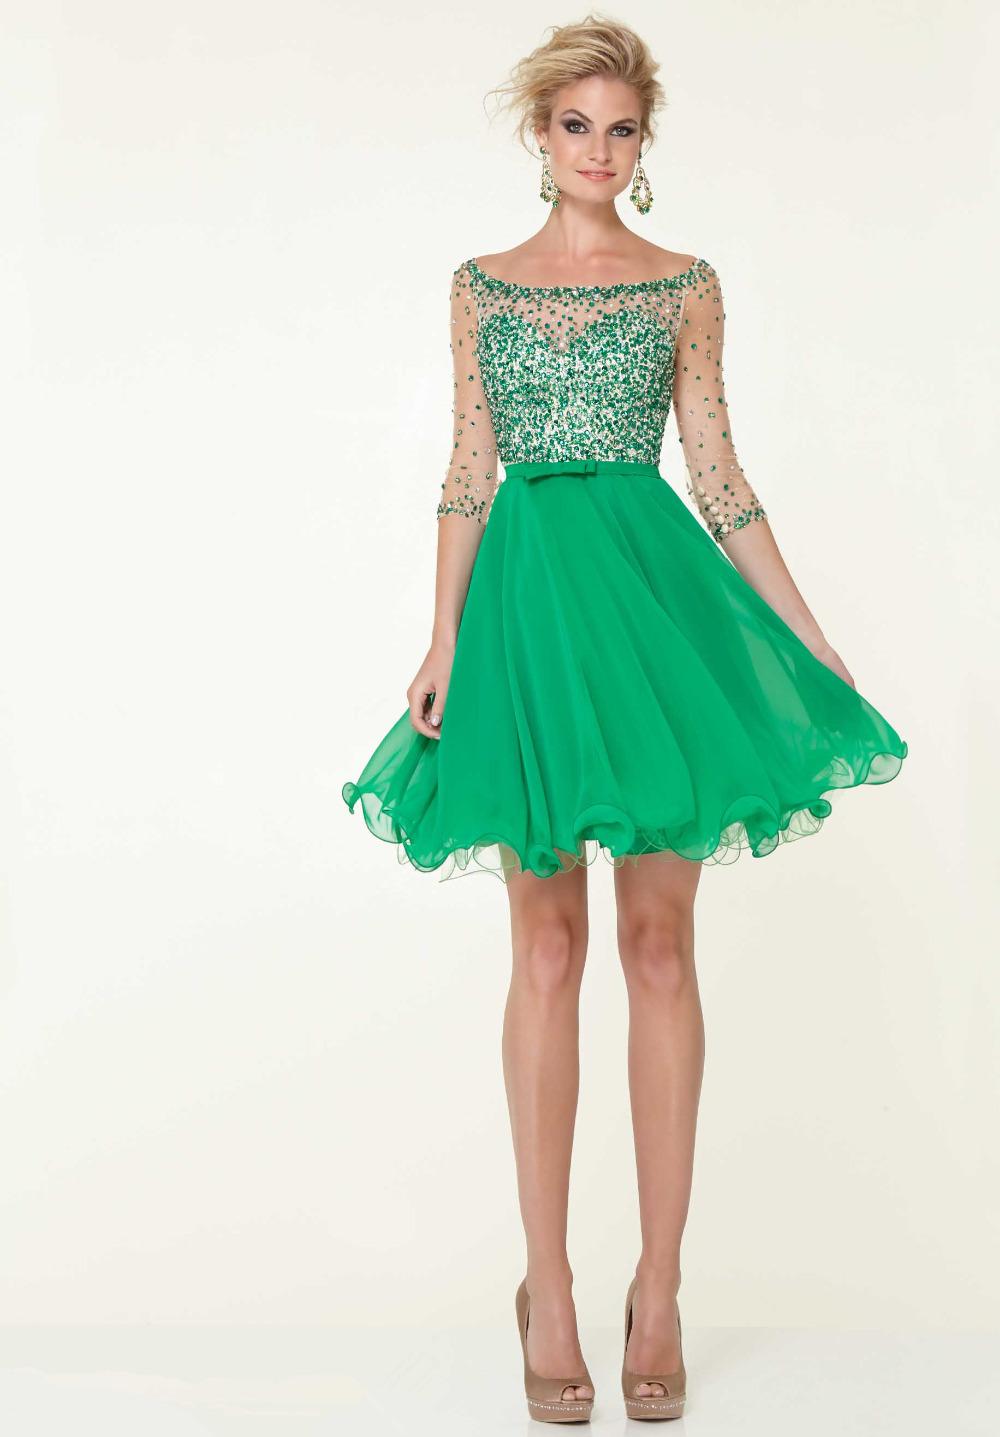 GREEN HOMECOMING DRESSES - Omenas Benen